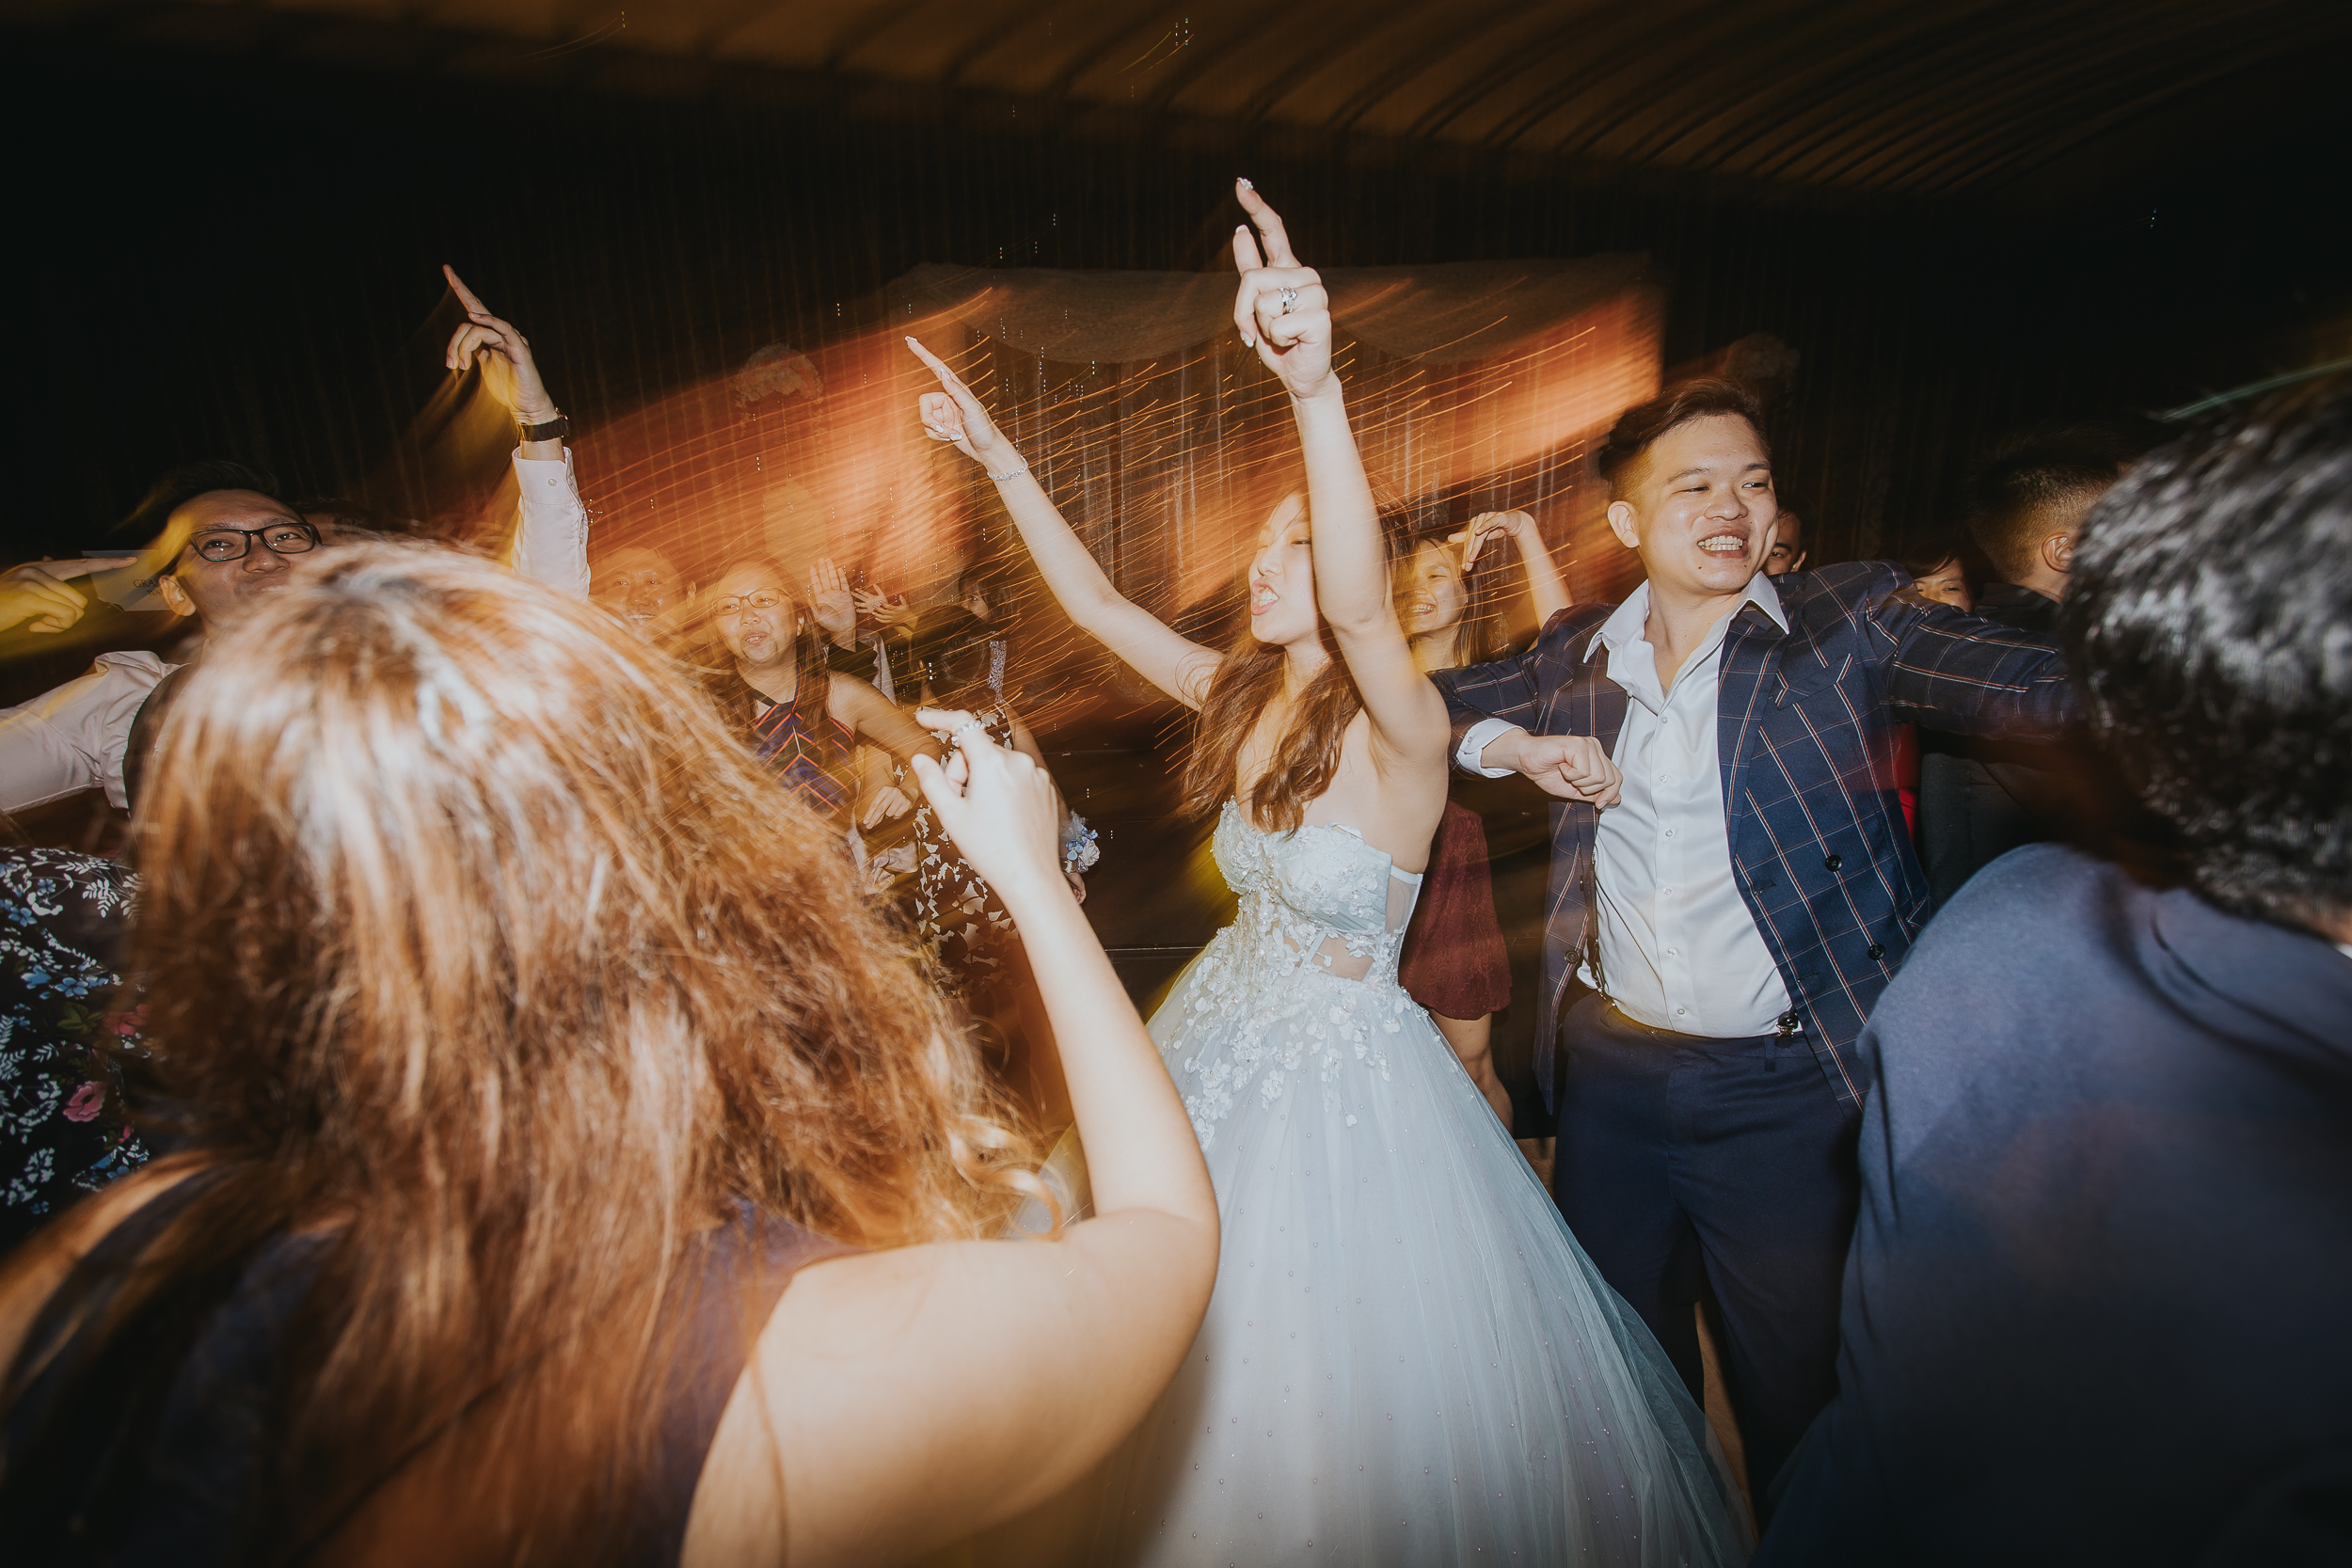 Singapore+Actual+Day+Wedding+Photographer+Grand+Mercure+Oliver+Estelle-0124.jpg